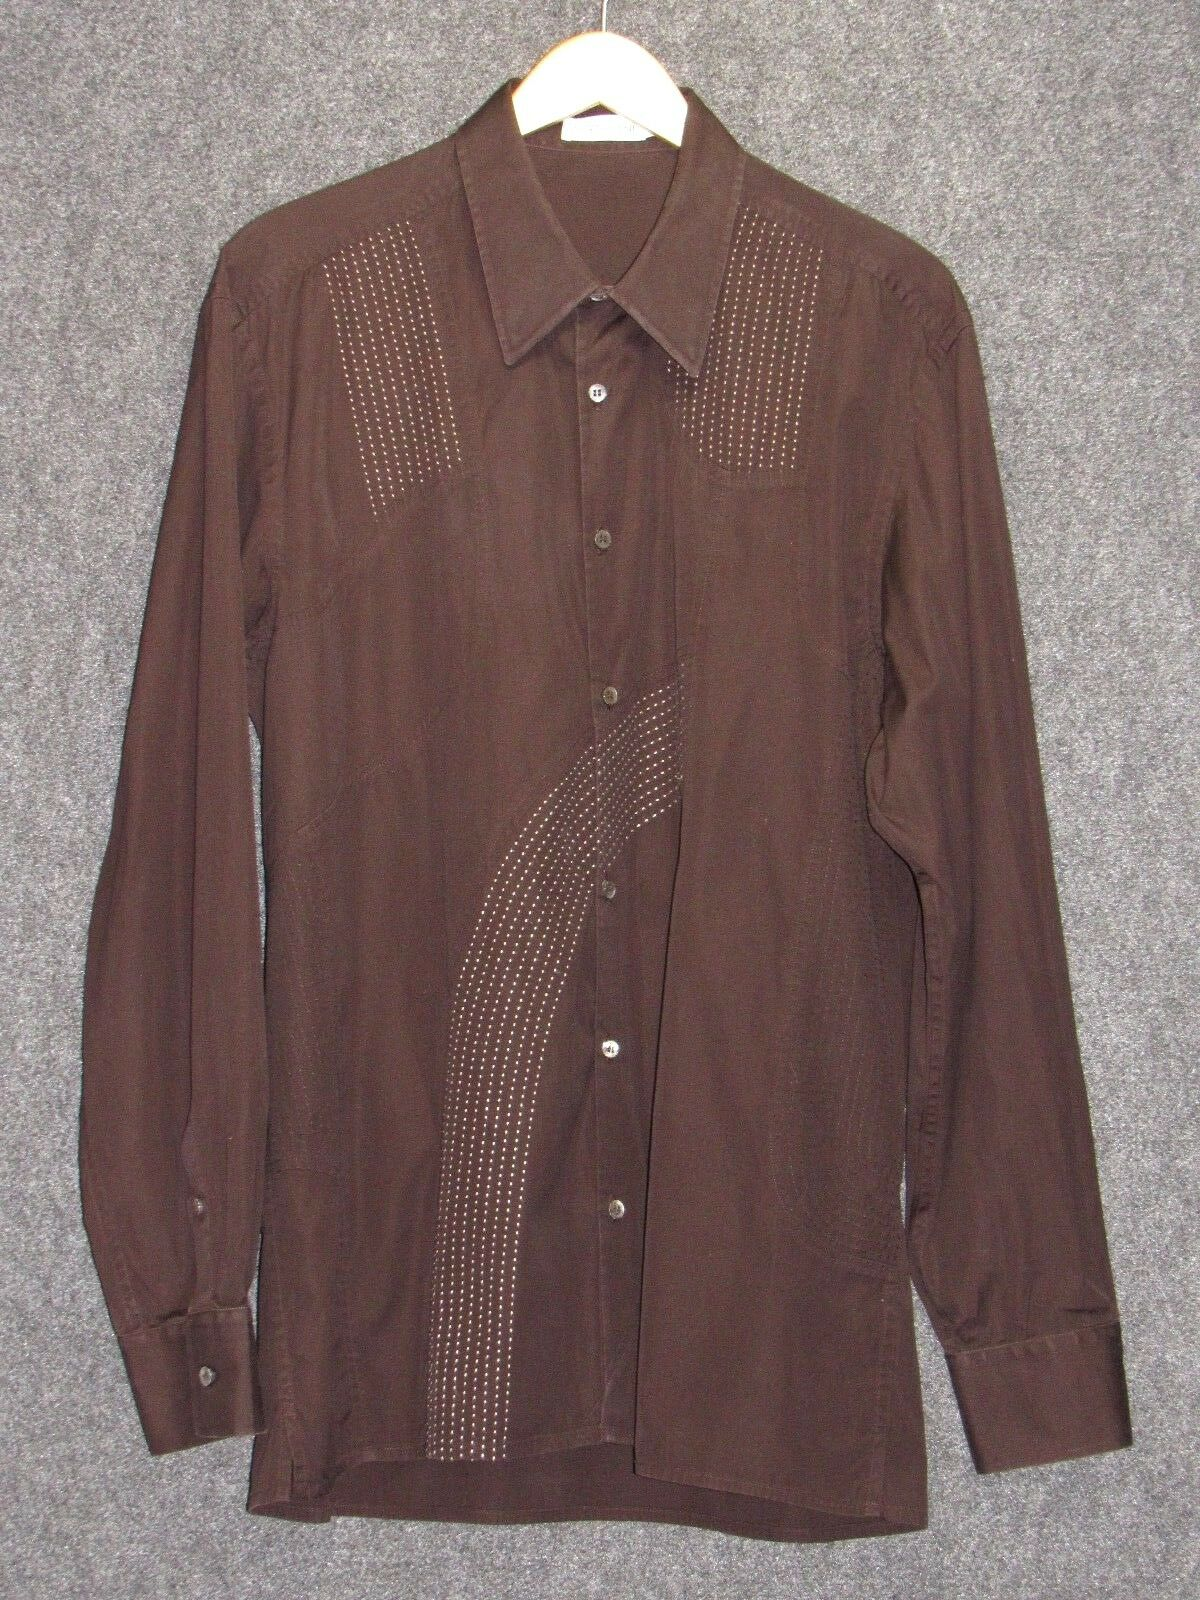 CORTIGIANI Brown Cotton Long Sleeves Mens Shirt SZ 56